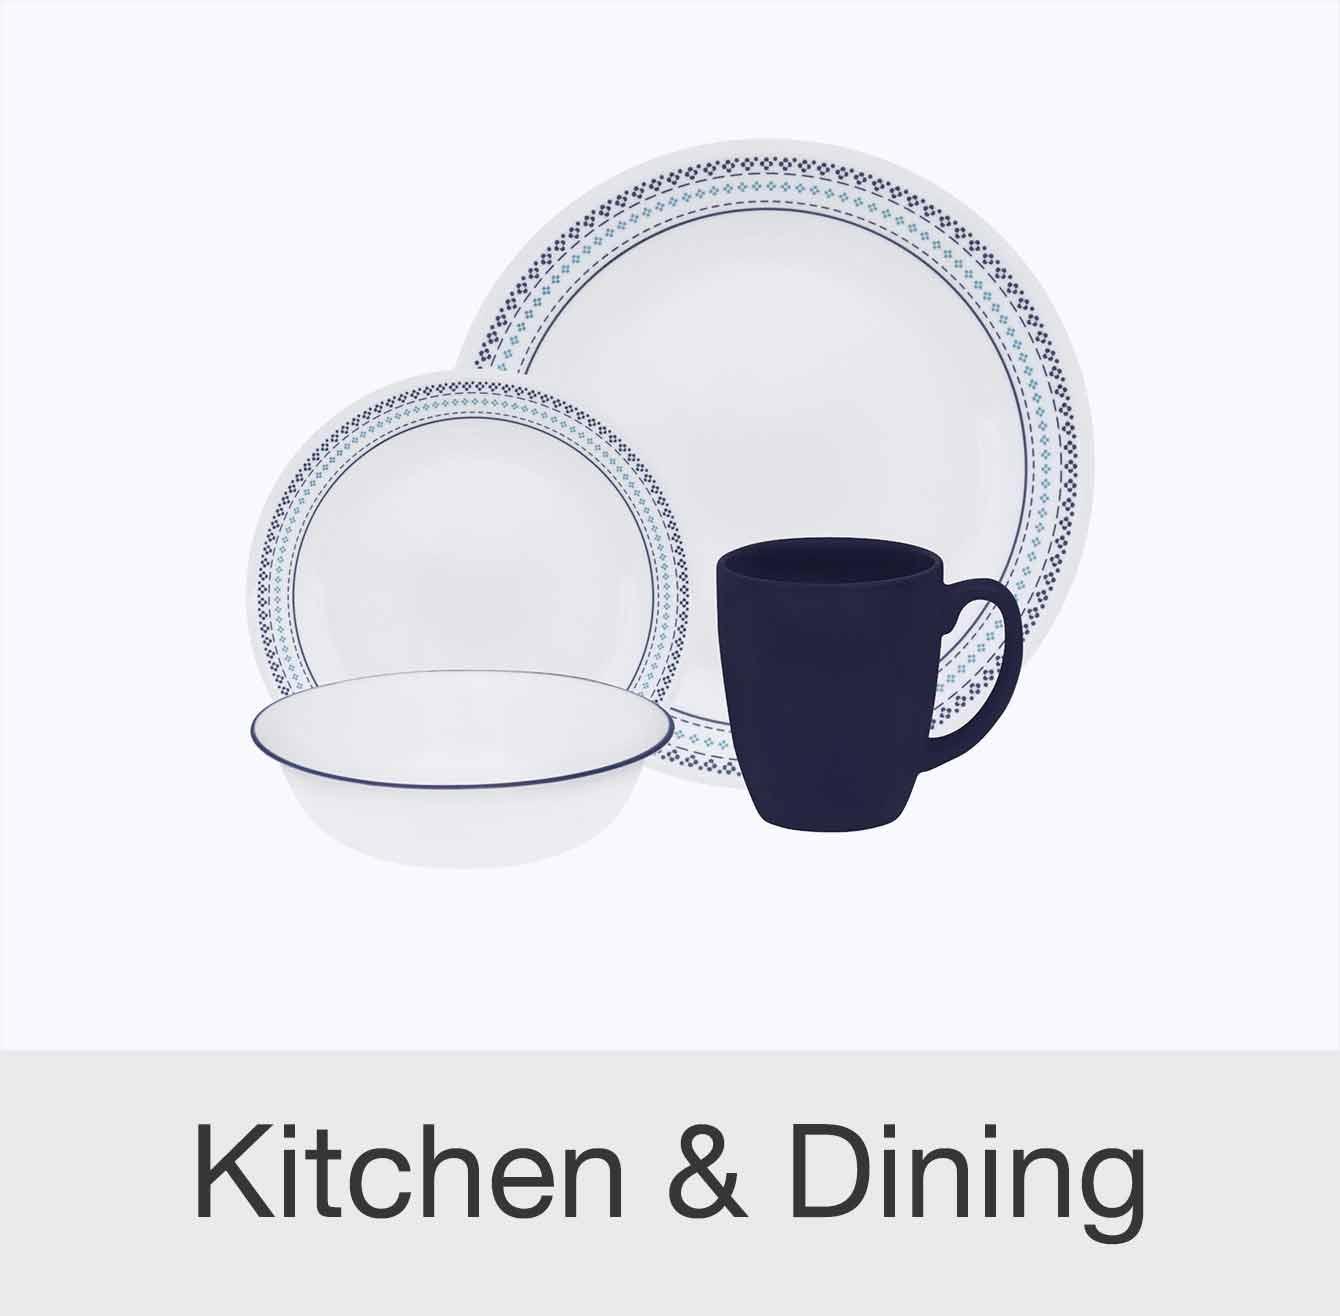 Amazoncom Kitchen amp Dining Home amp Kitchen Dining